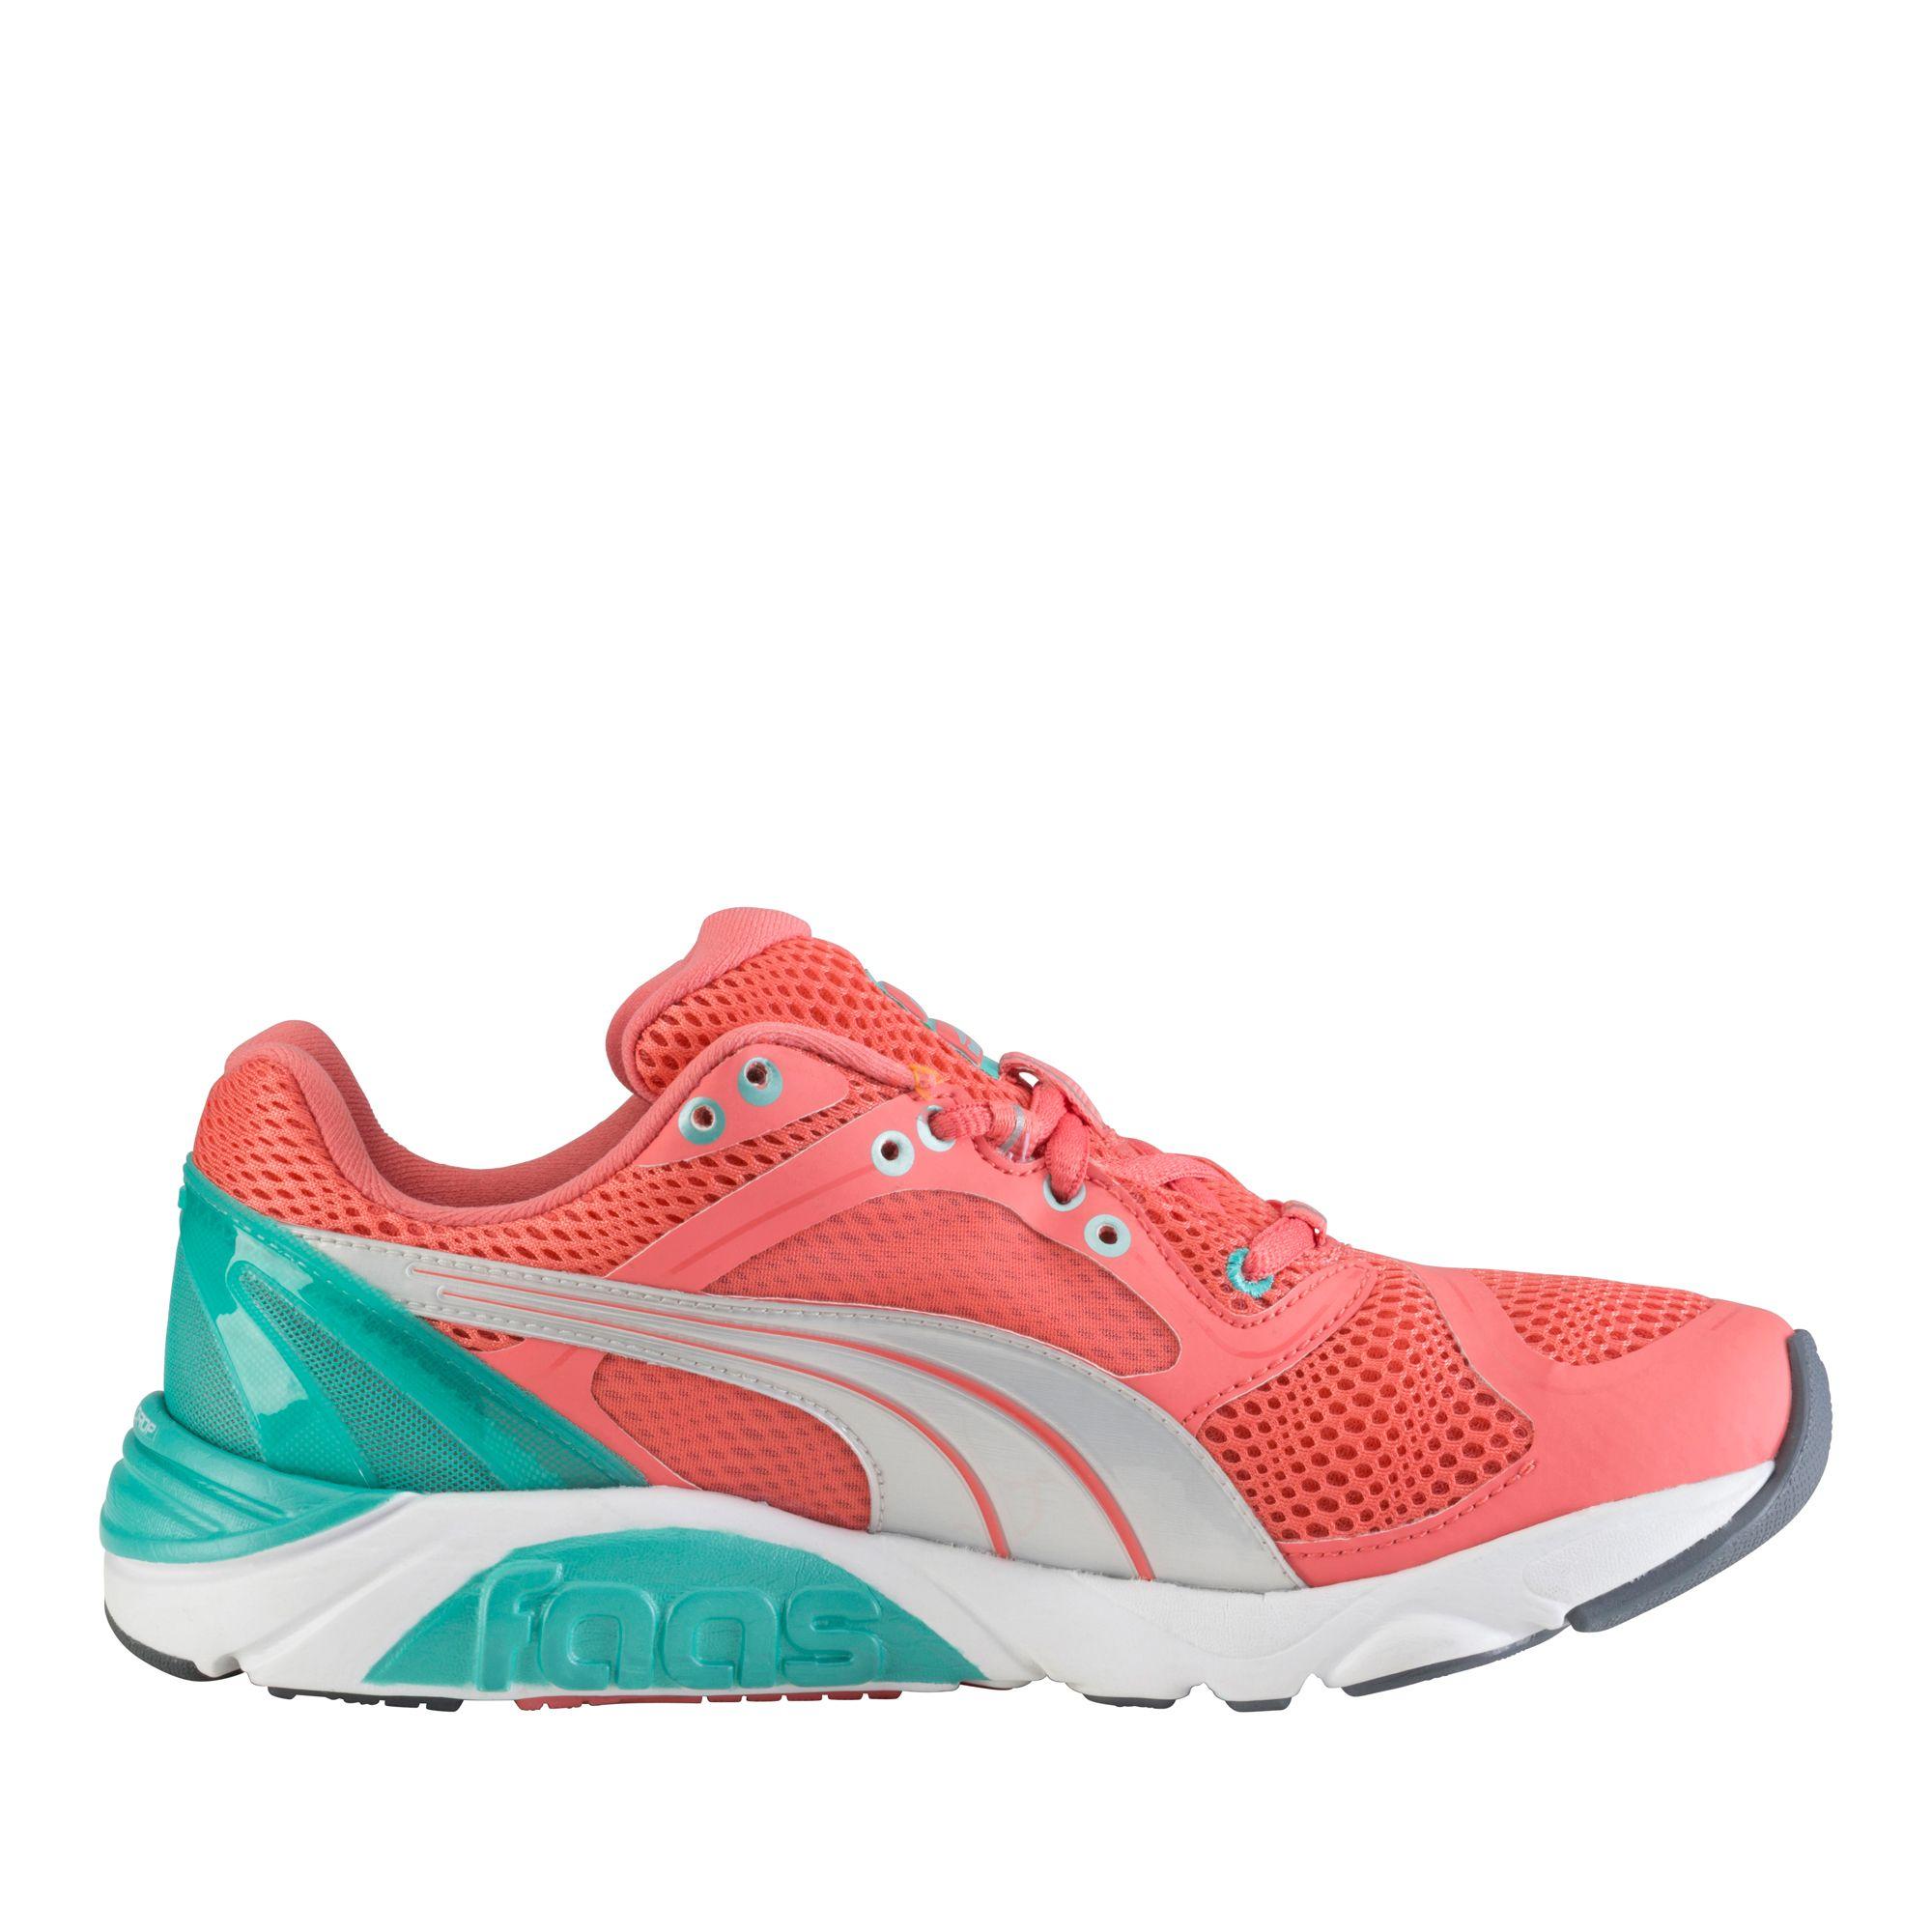 Puma Faas Running Shoes